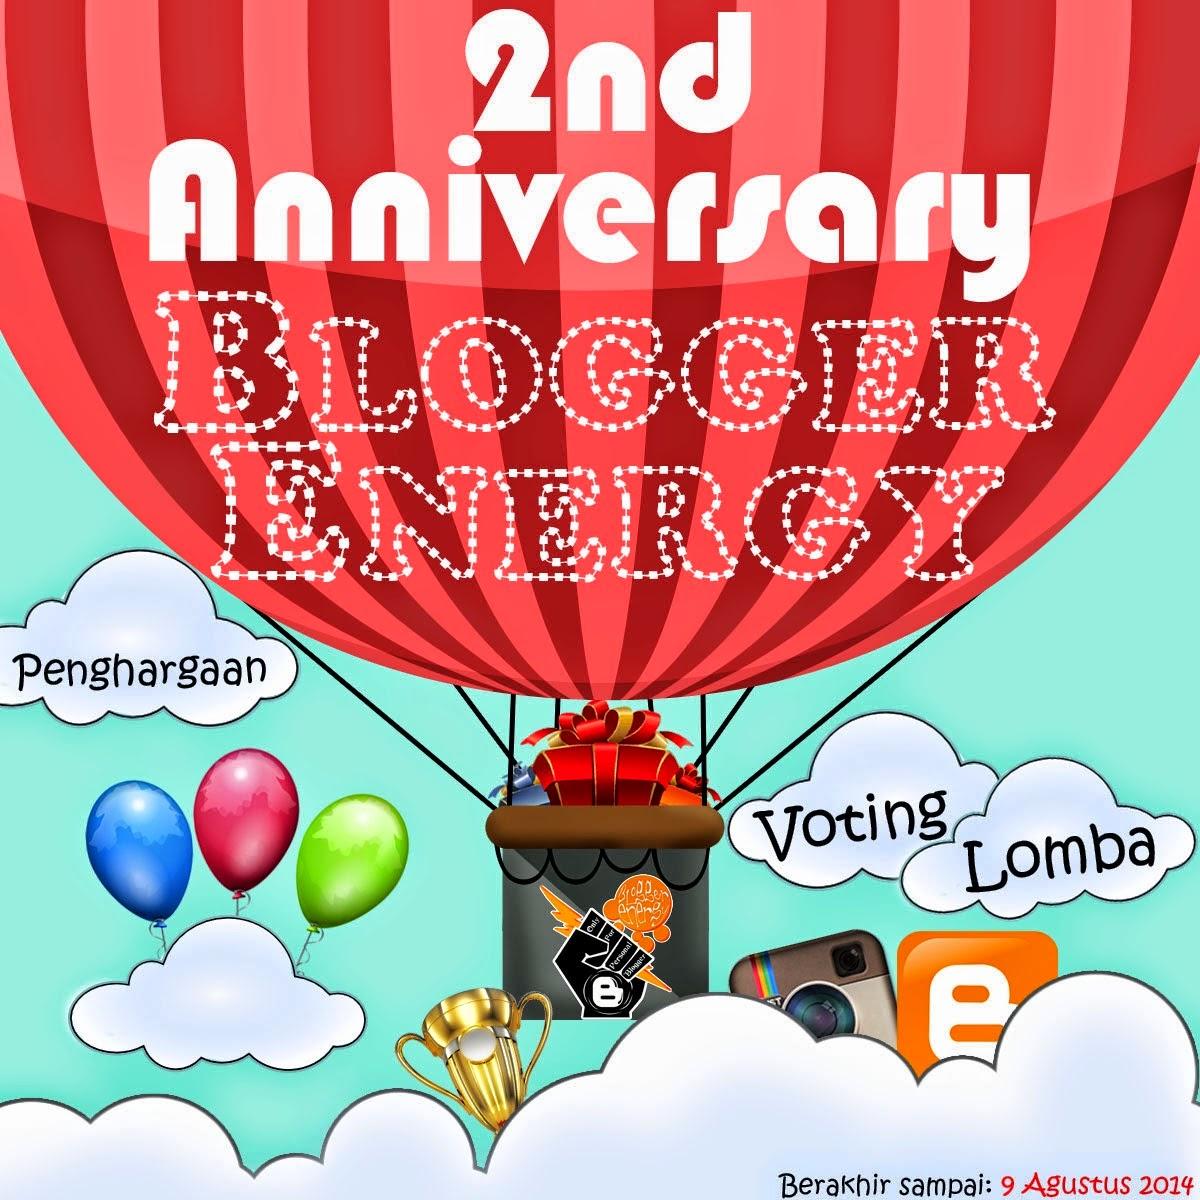 Ulang Tahun, Blogger Energy